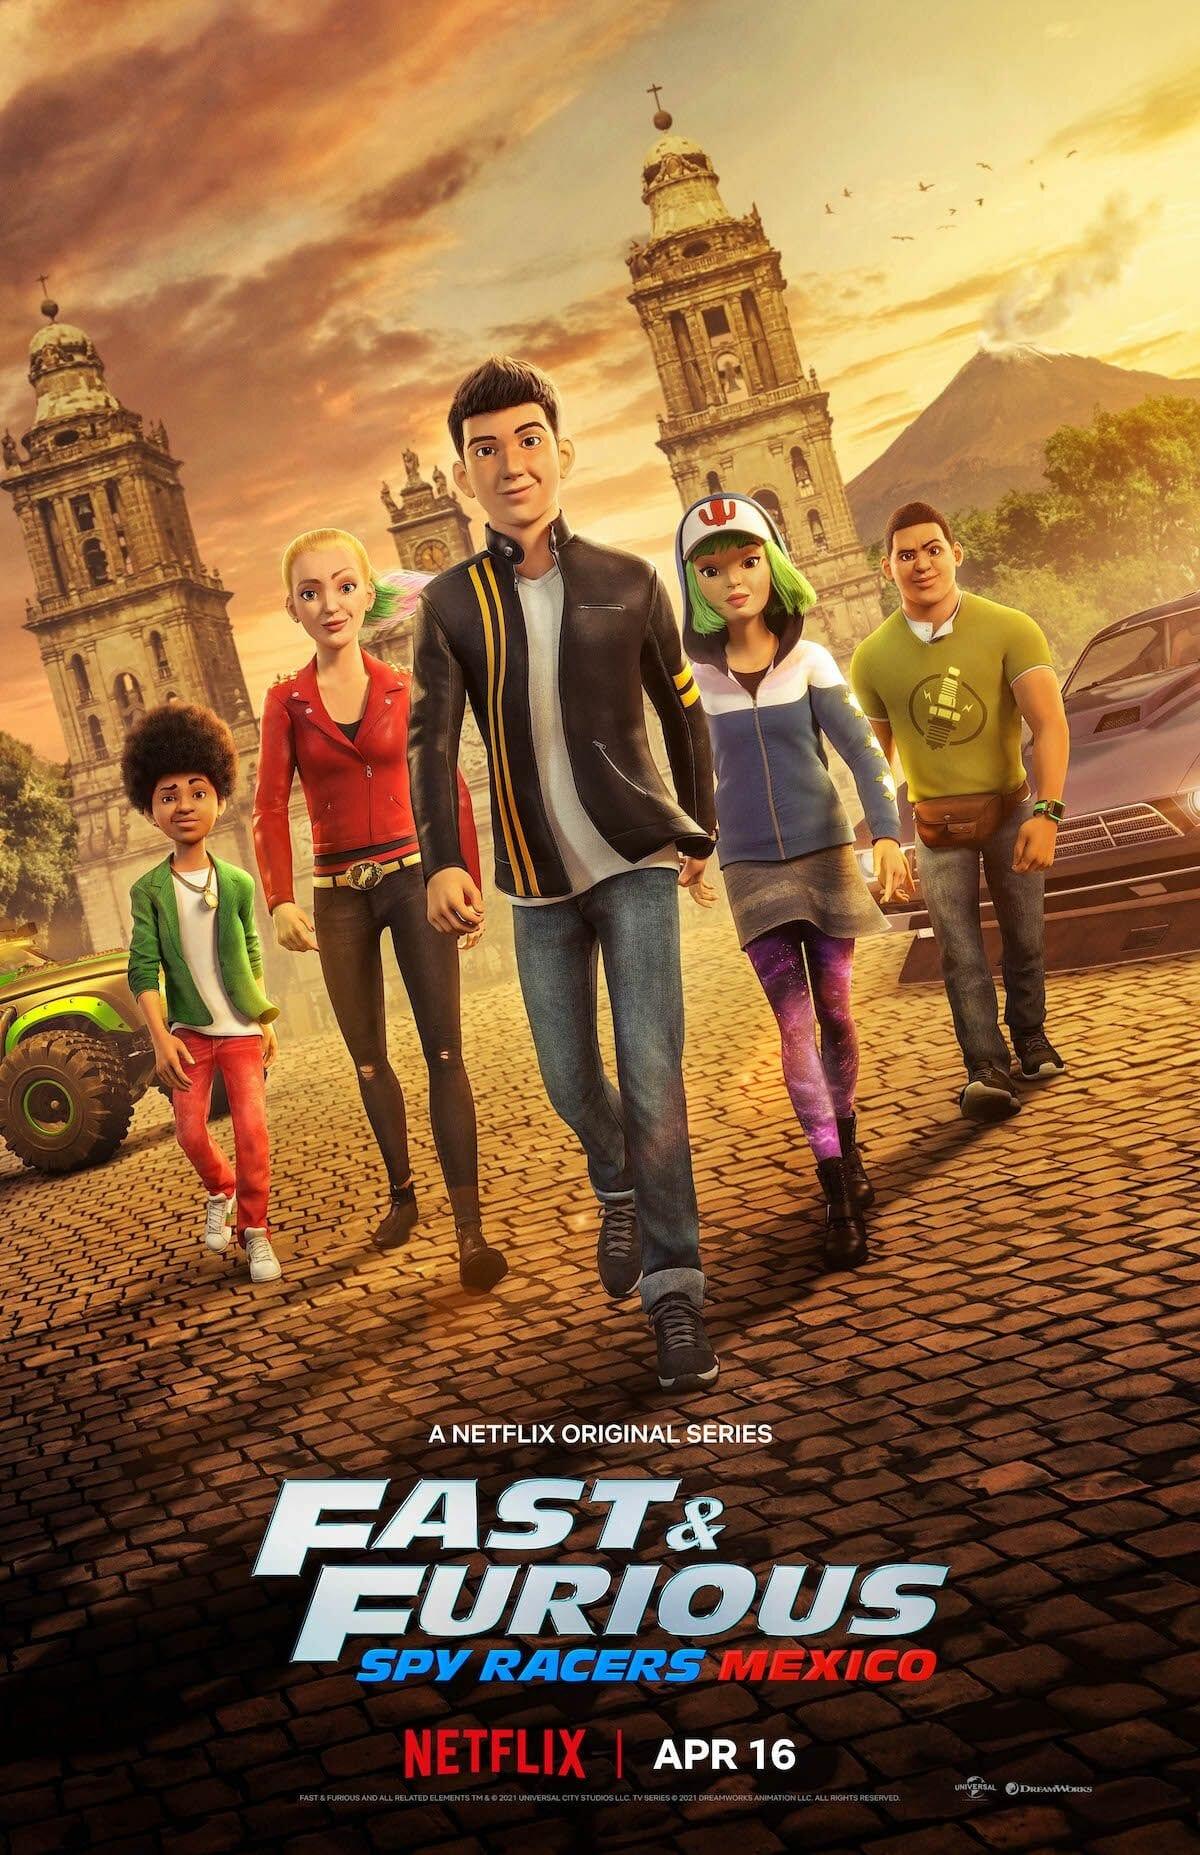 Fast & Furious: Spy Racers teaser image